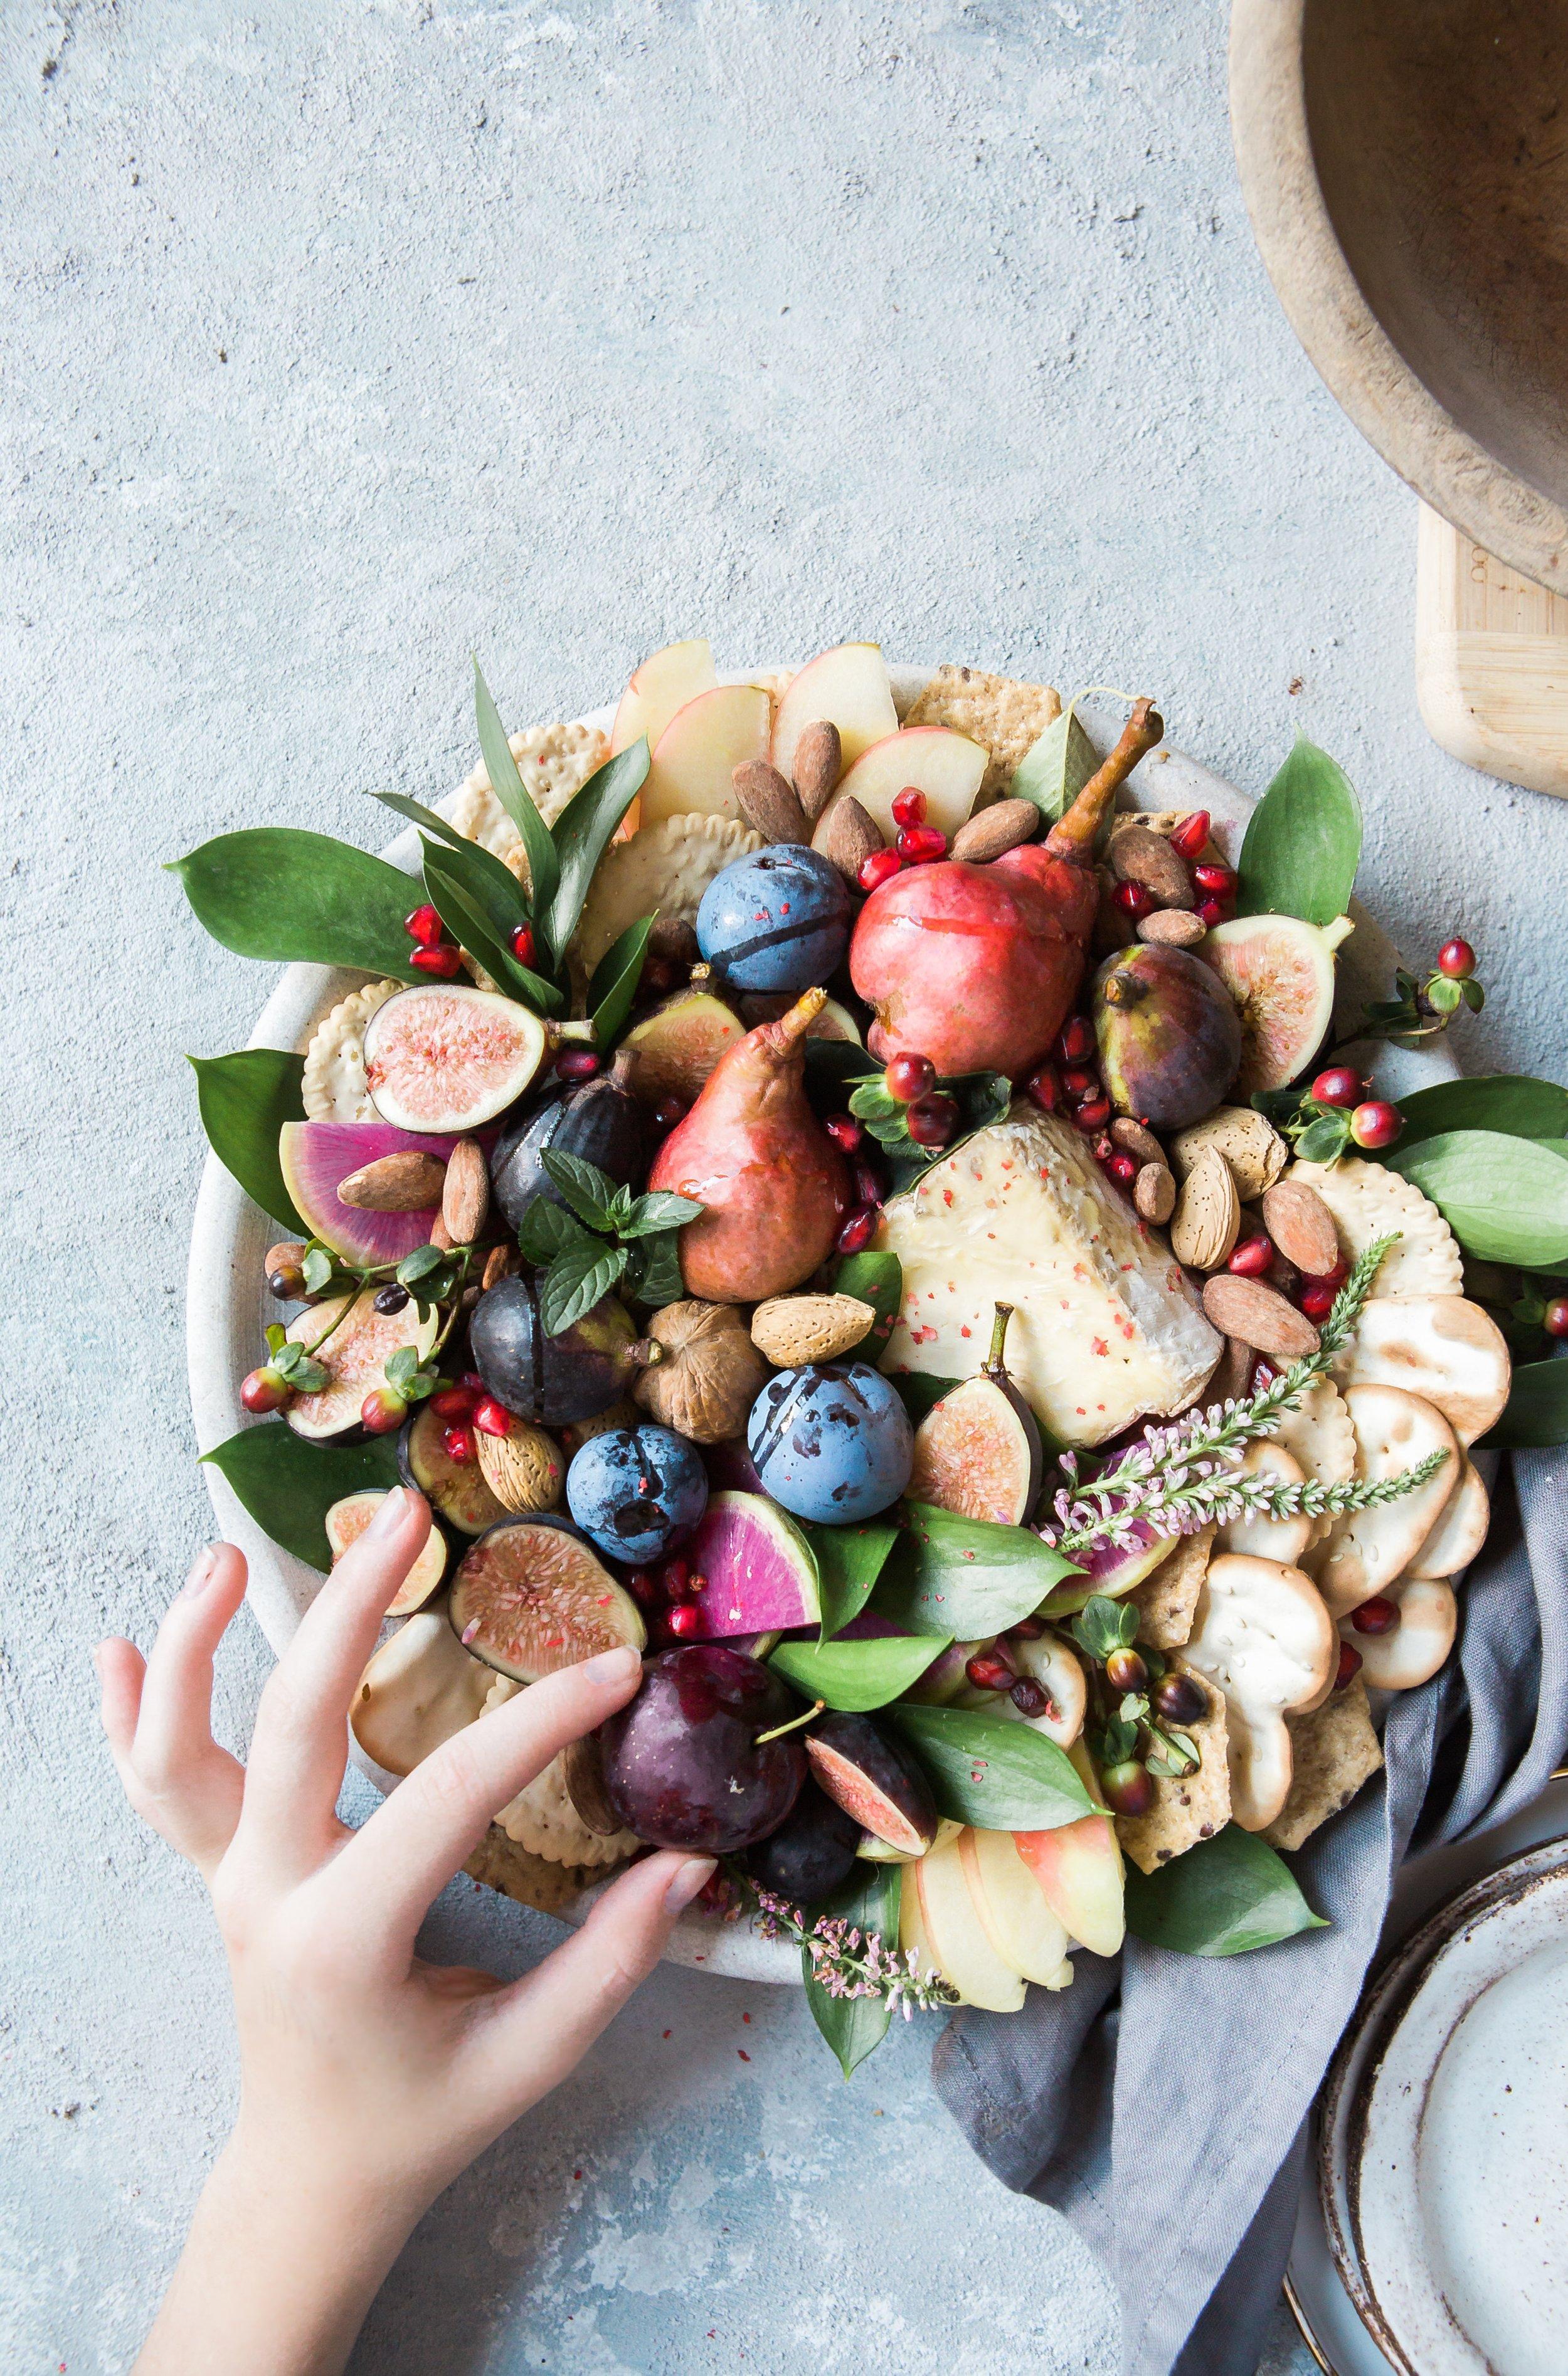 nutrition-cancerrisks-nutritionandhealth-heartdisease-preventingdisease.jpg